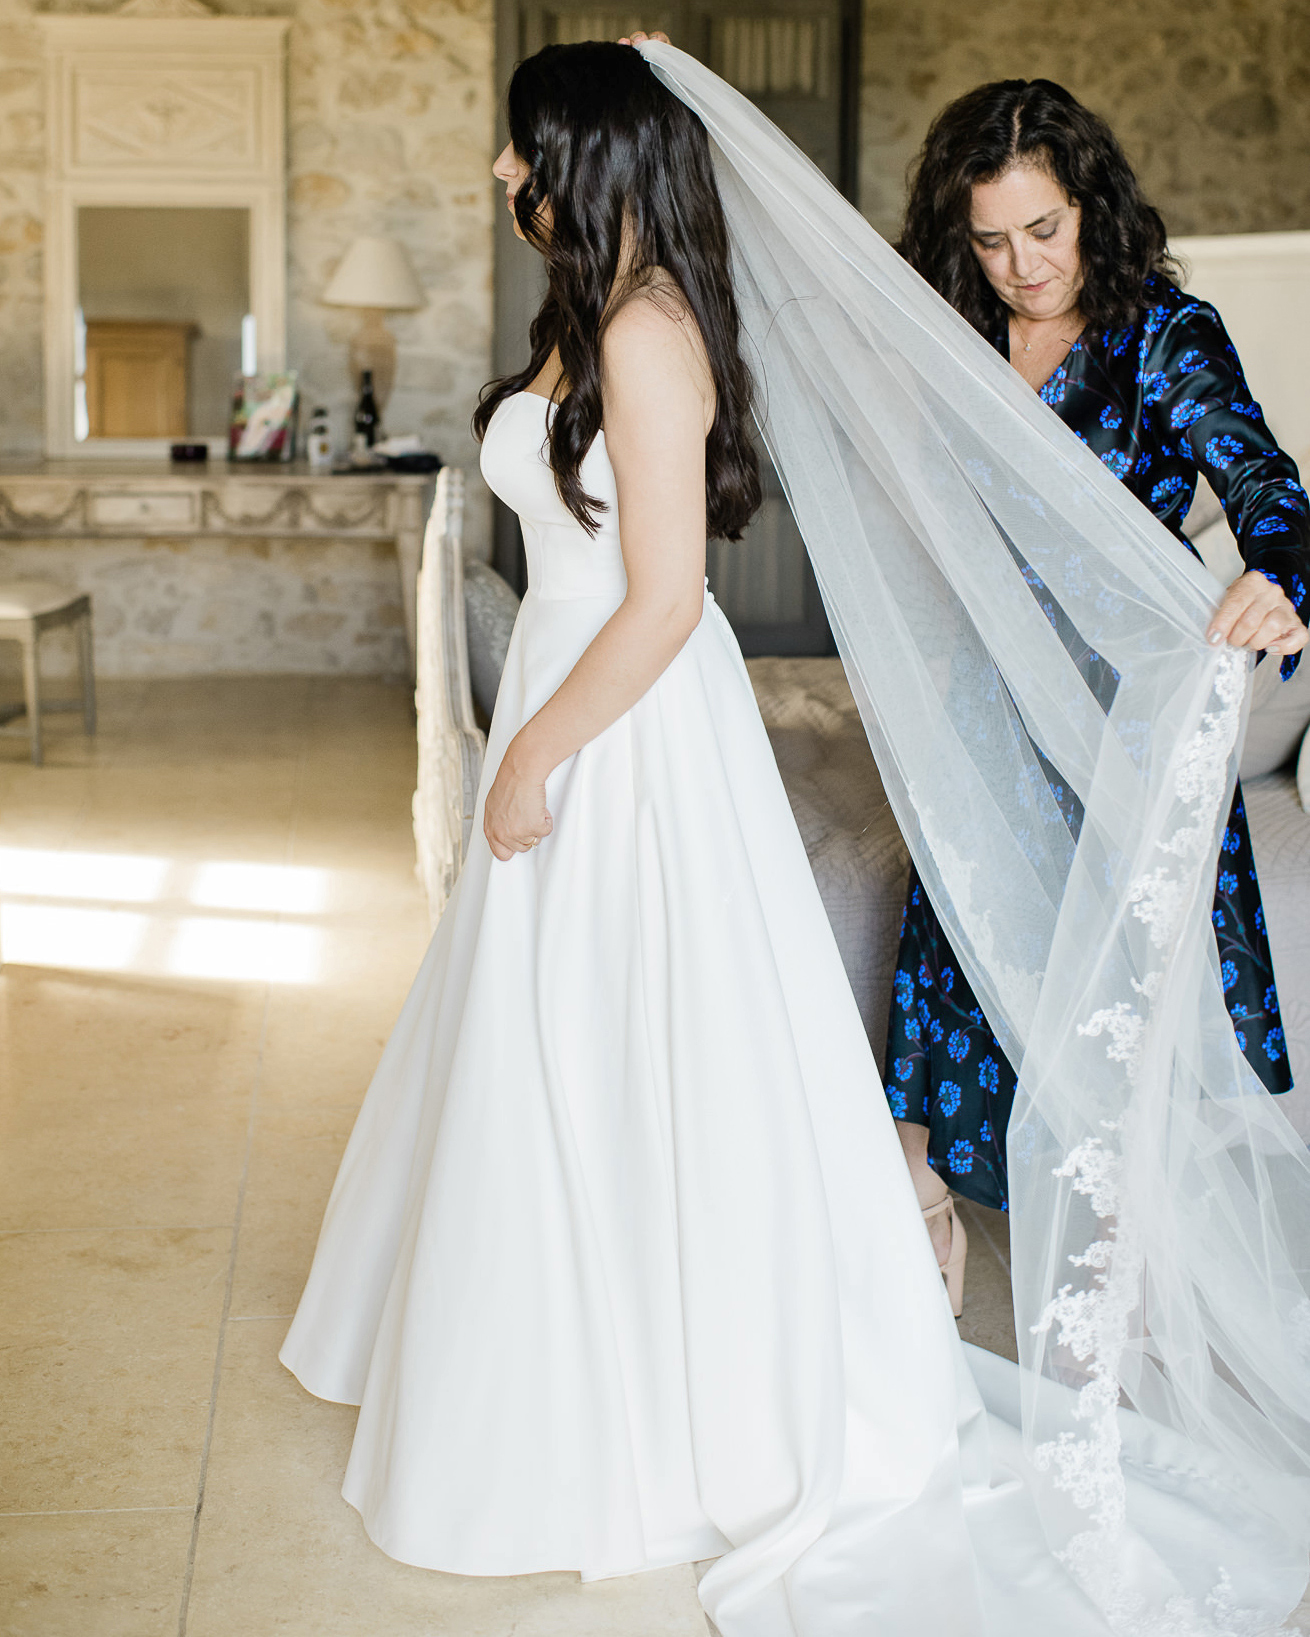 samantha grayson wedding mother and bride